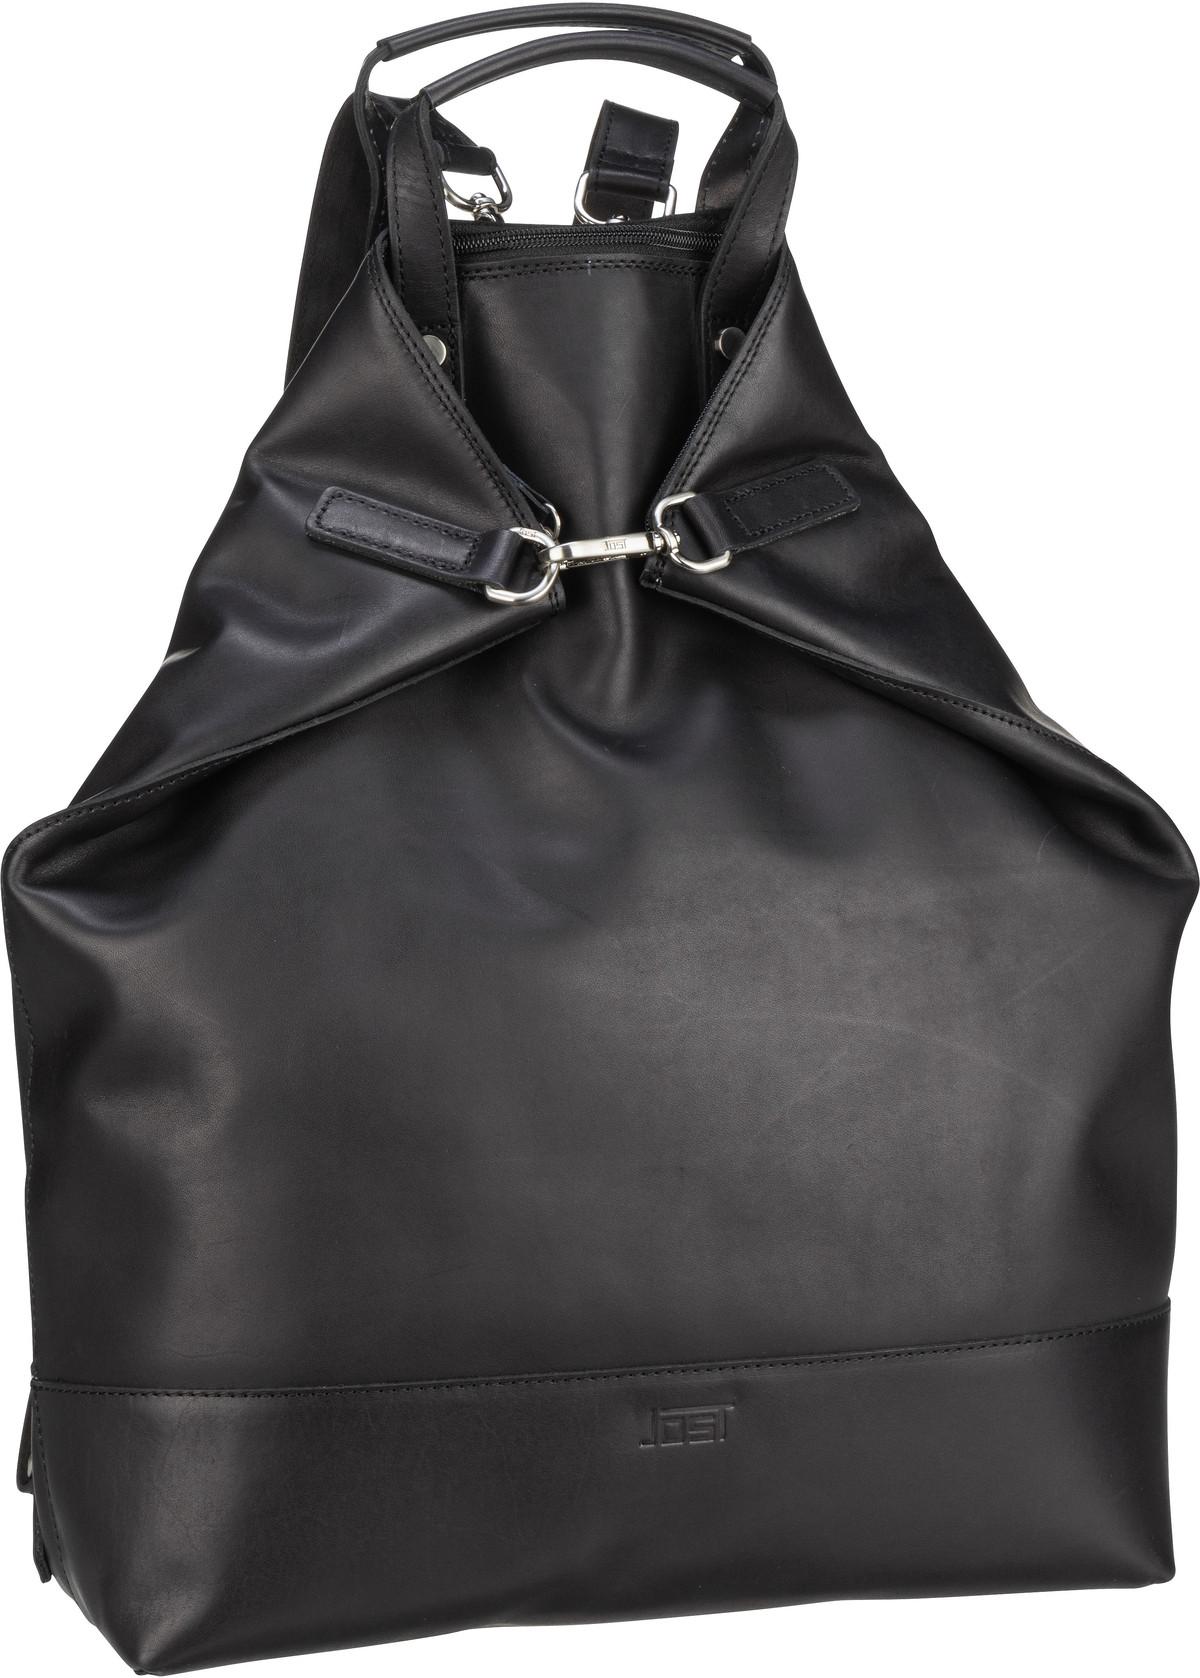 Rucksack / Daypack Rana 1280 X-Change Bag M Black